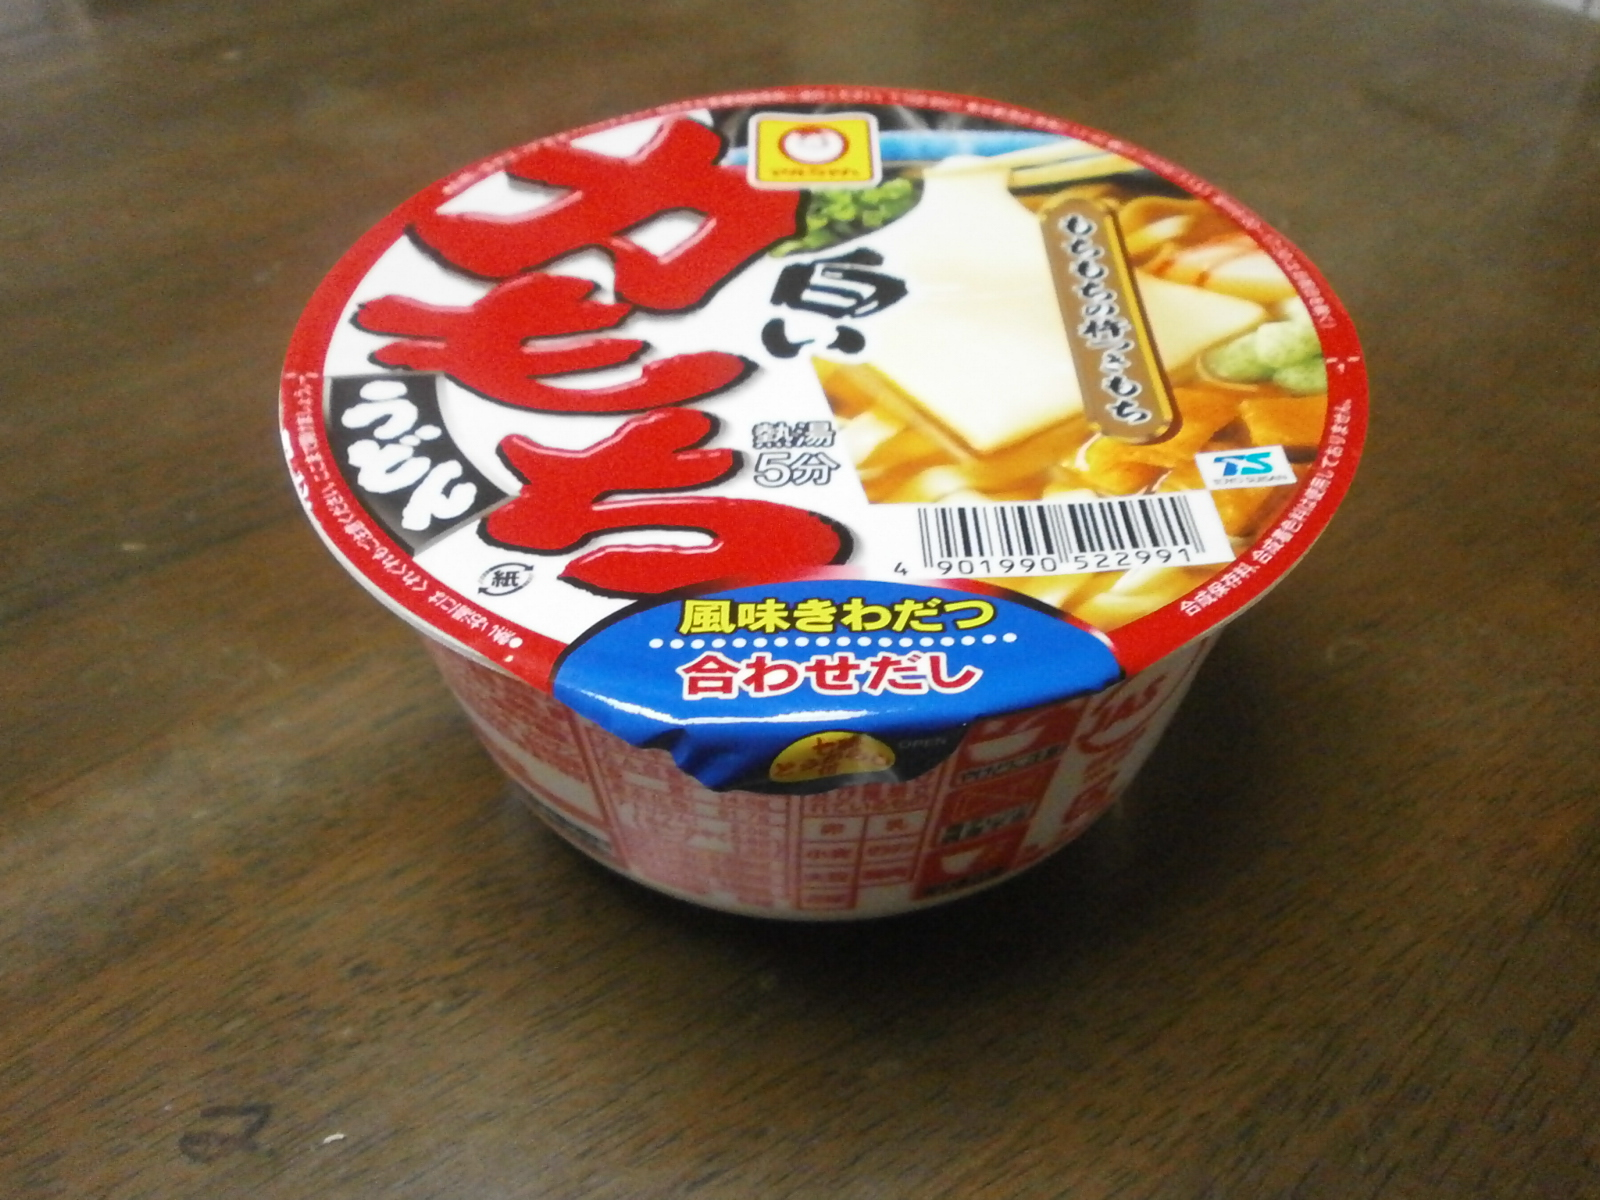 comida japon japonshop  Itadakimasu - Fideos Udon Kitsune Mochi White